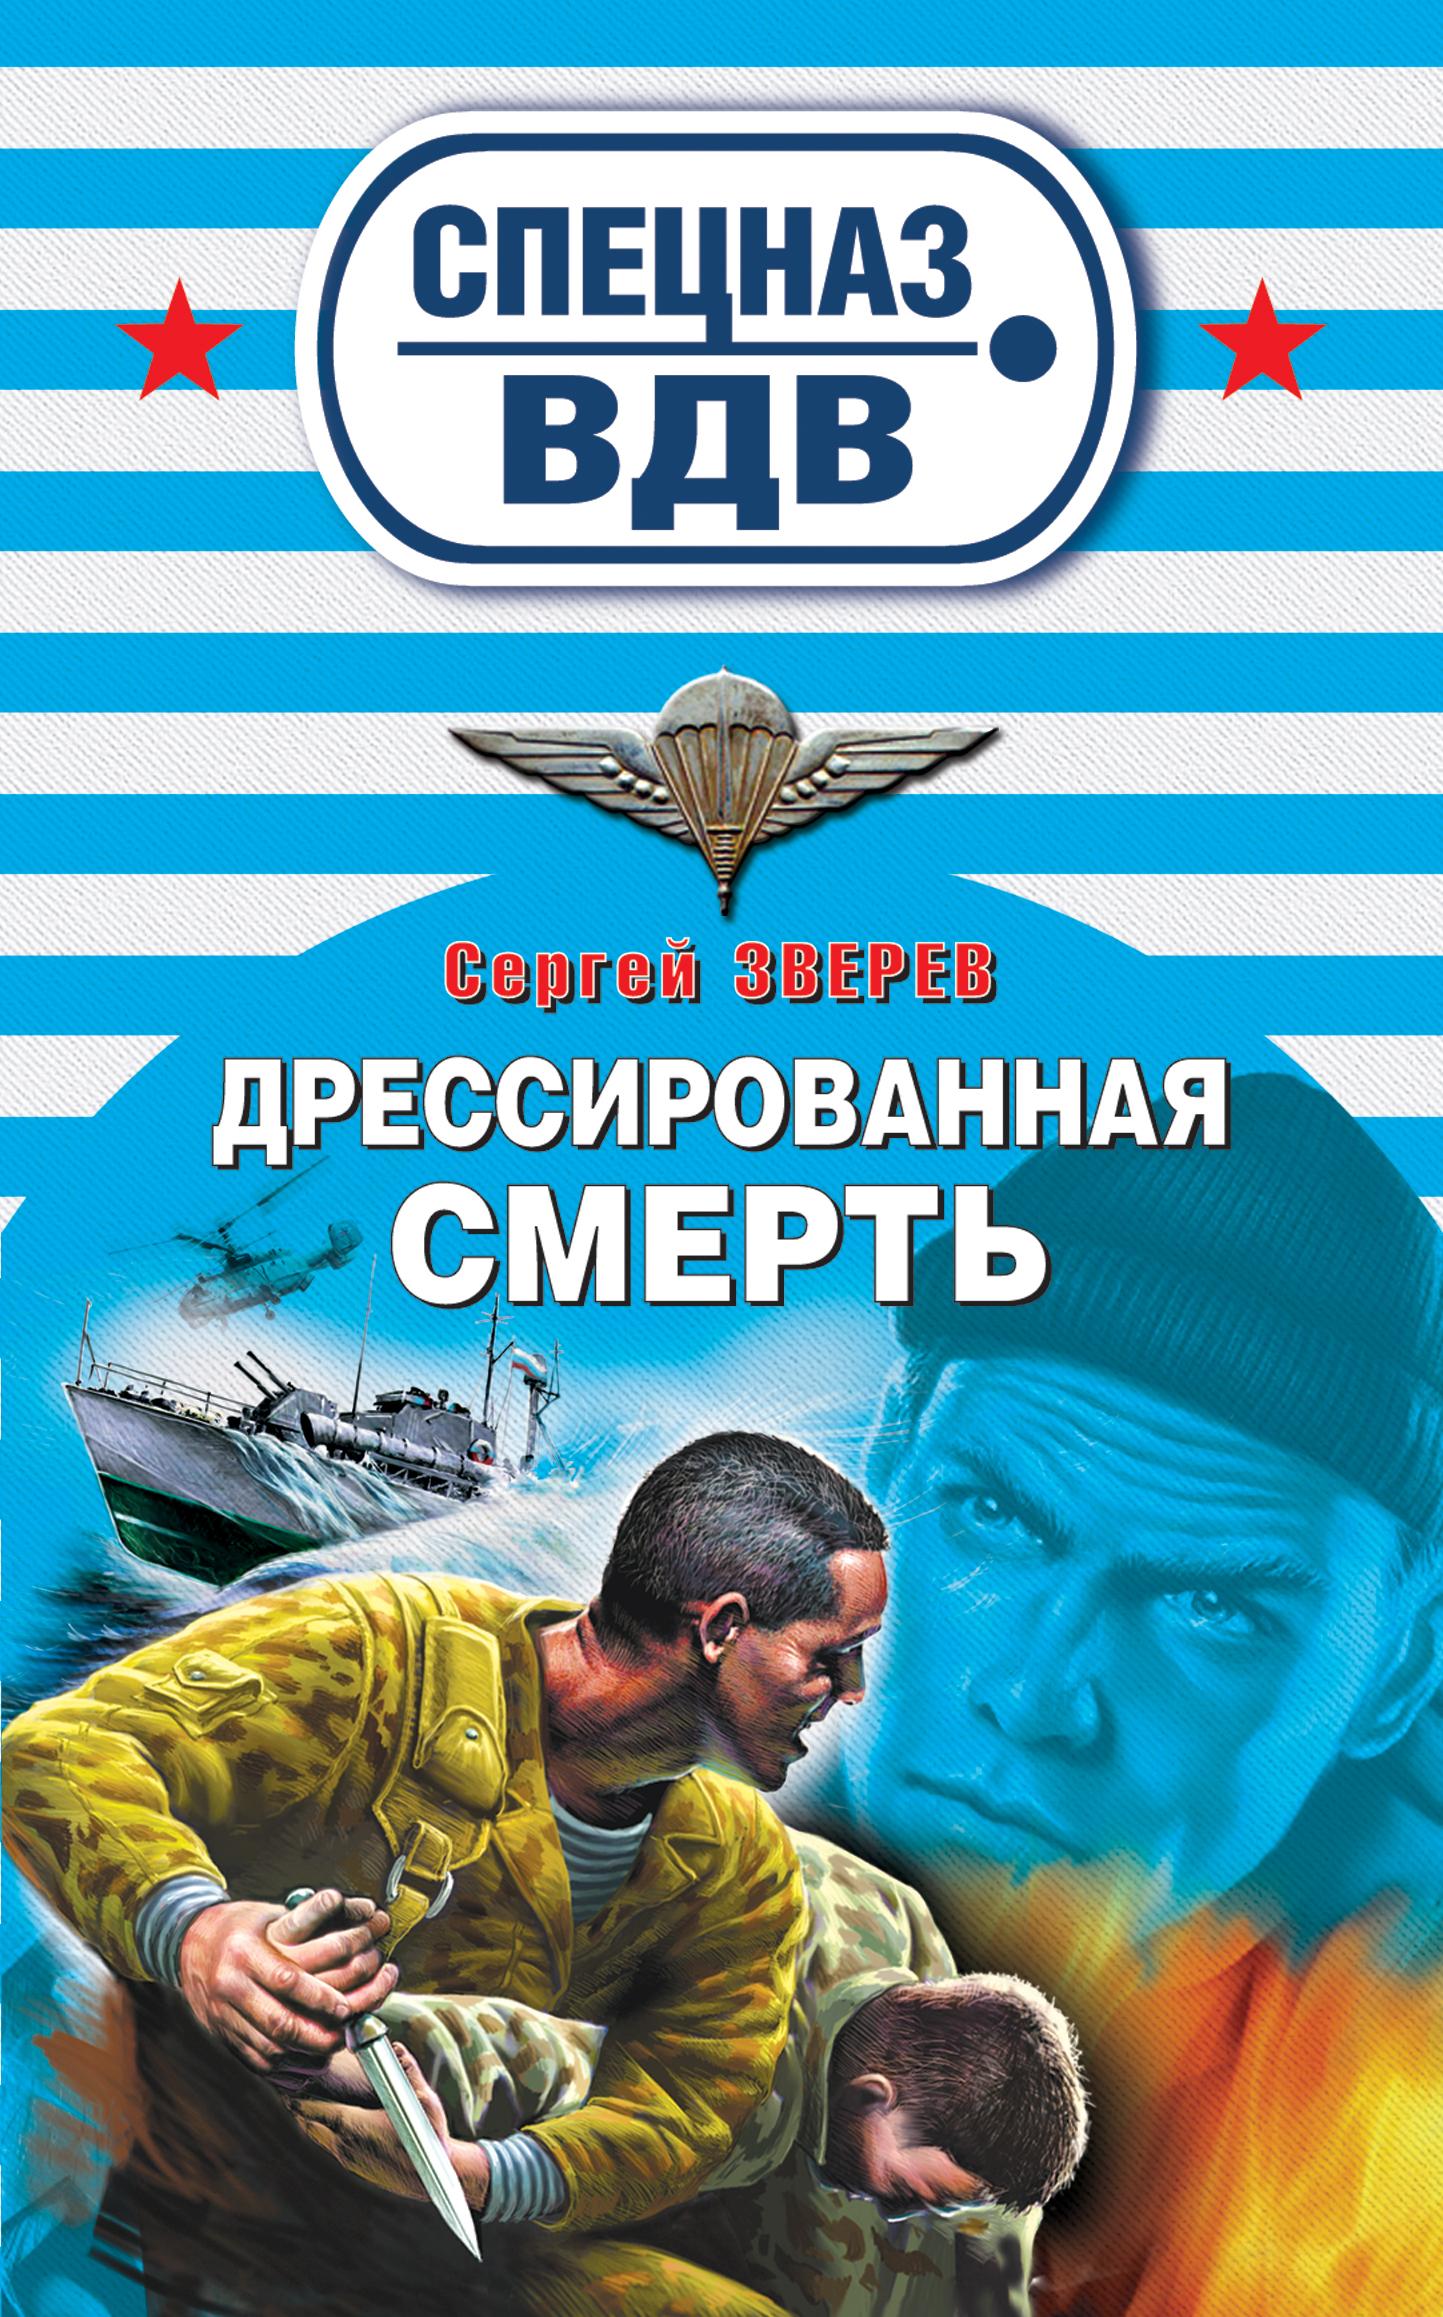 Сергей Зверев Дрессированная смерть сергей зверев игры шакалов